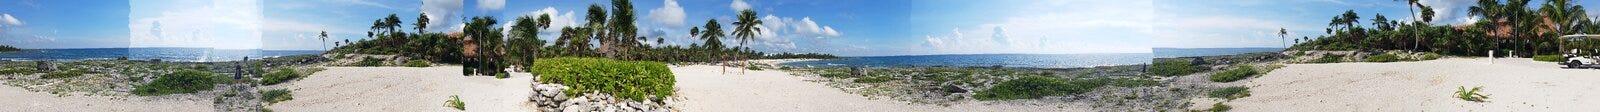 Panorama de Cancun imagens de stock royalty free